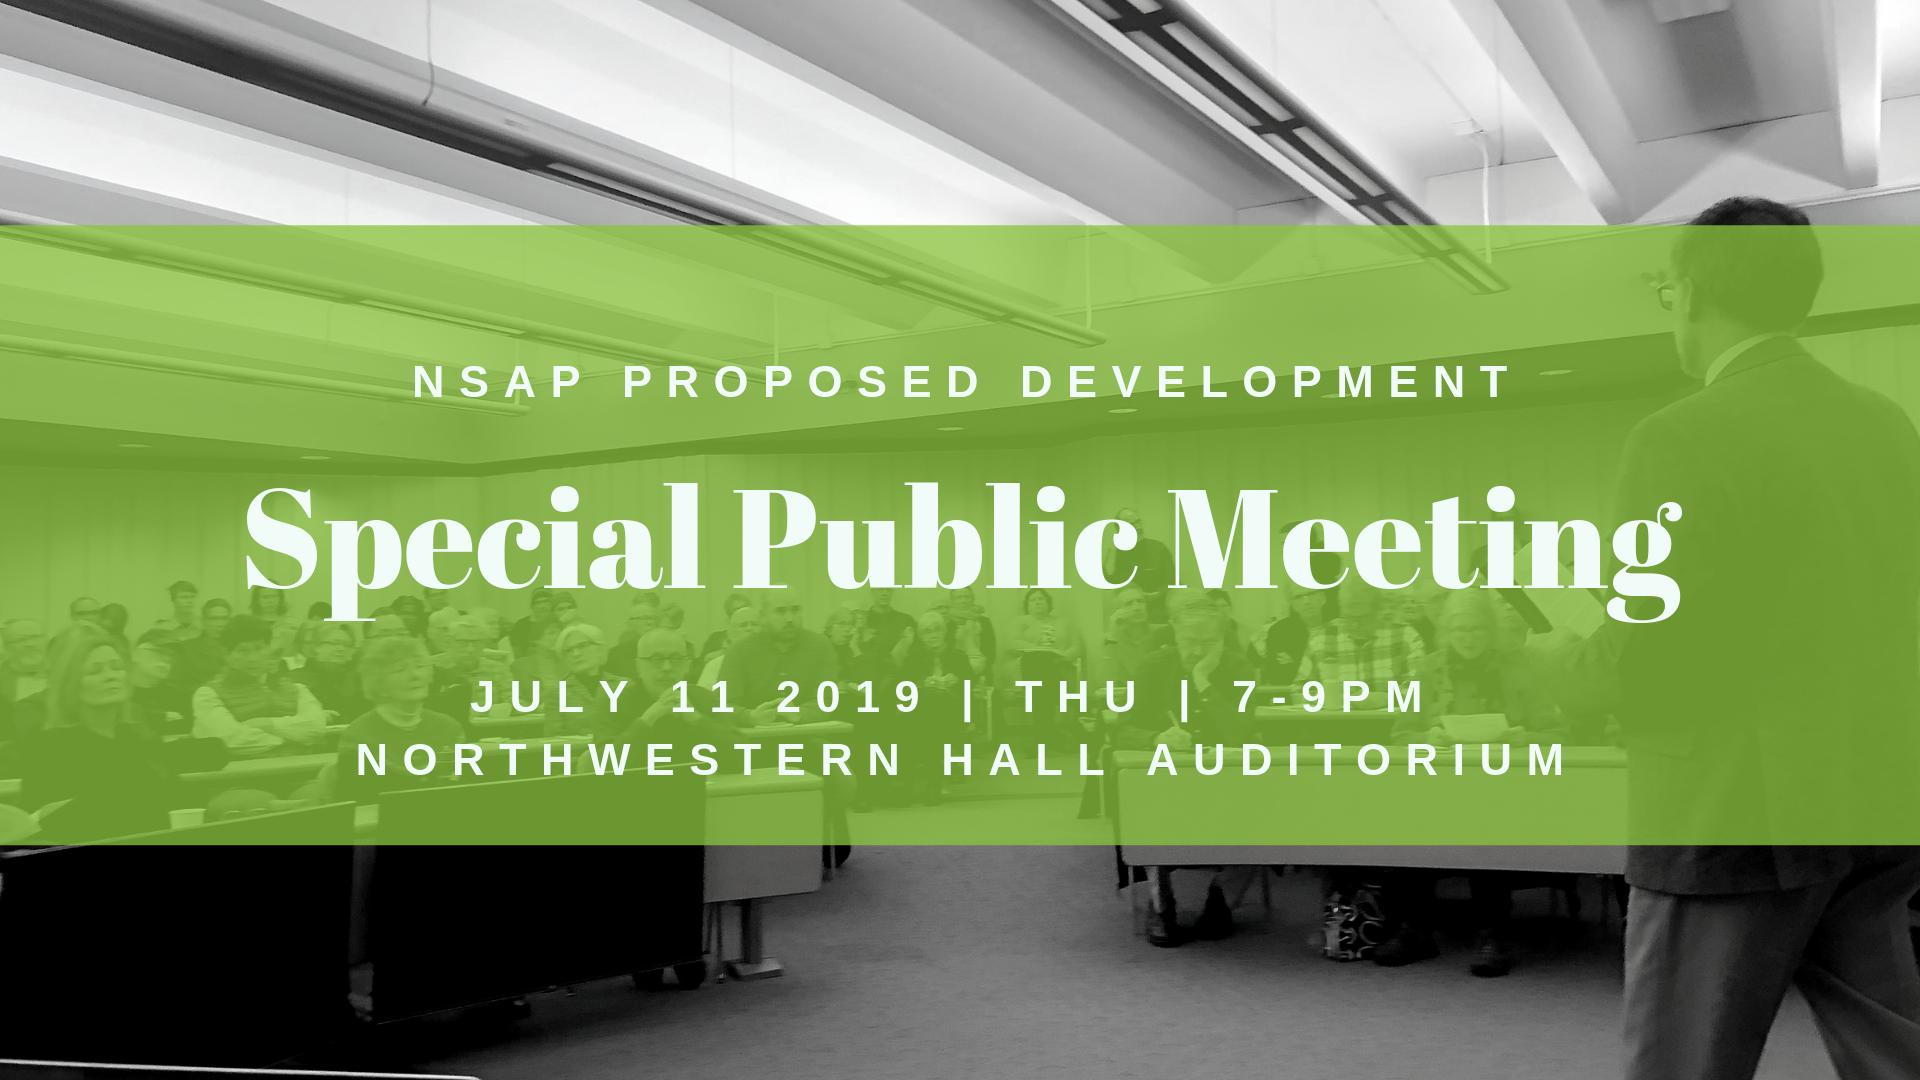 Special Public Meeting